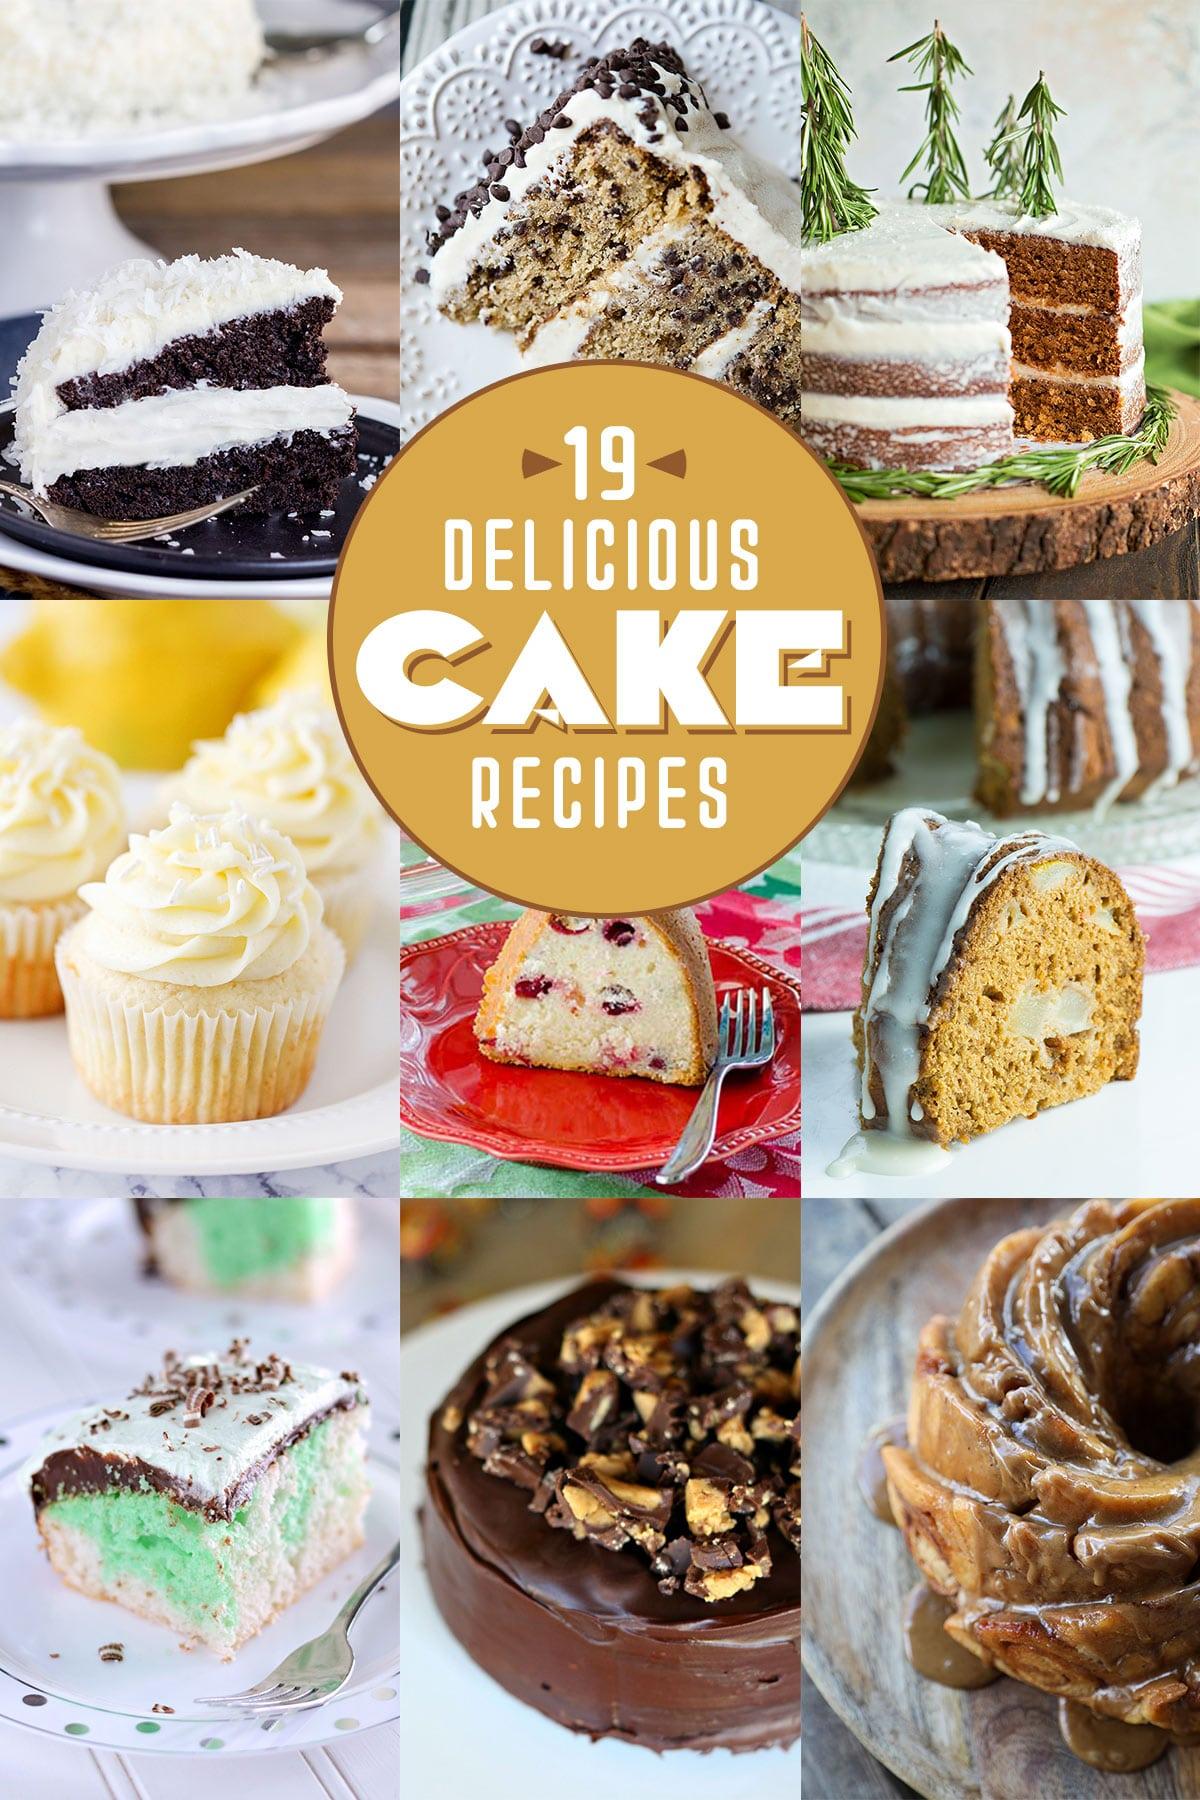 19 Delicious Cake Recipes | realmomkitchen.com